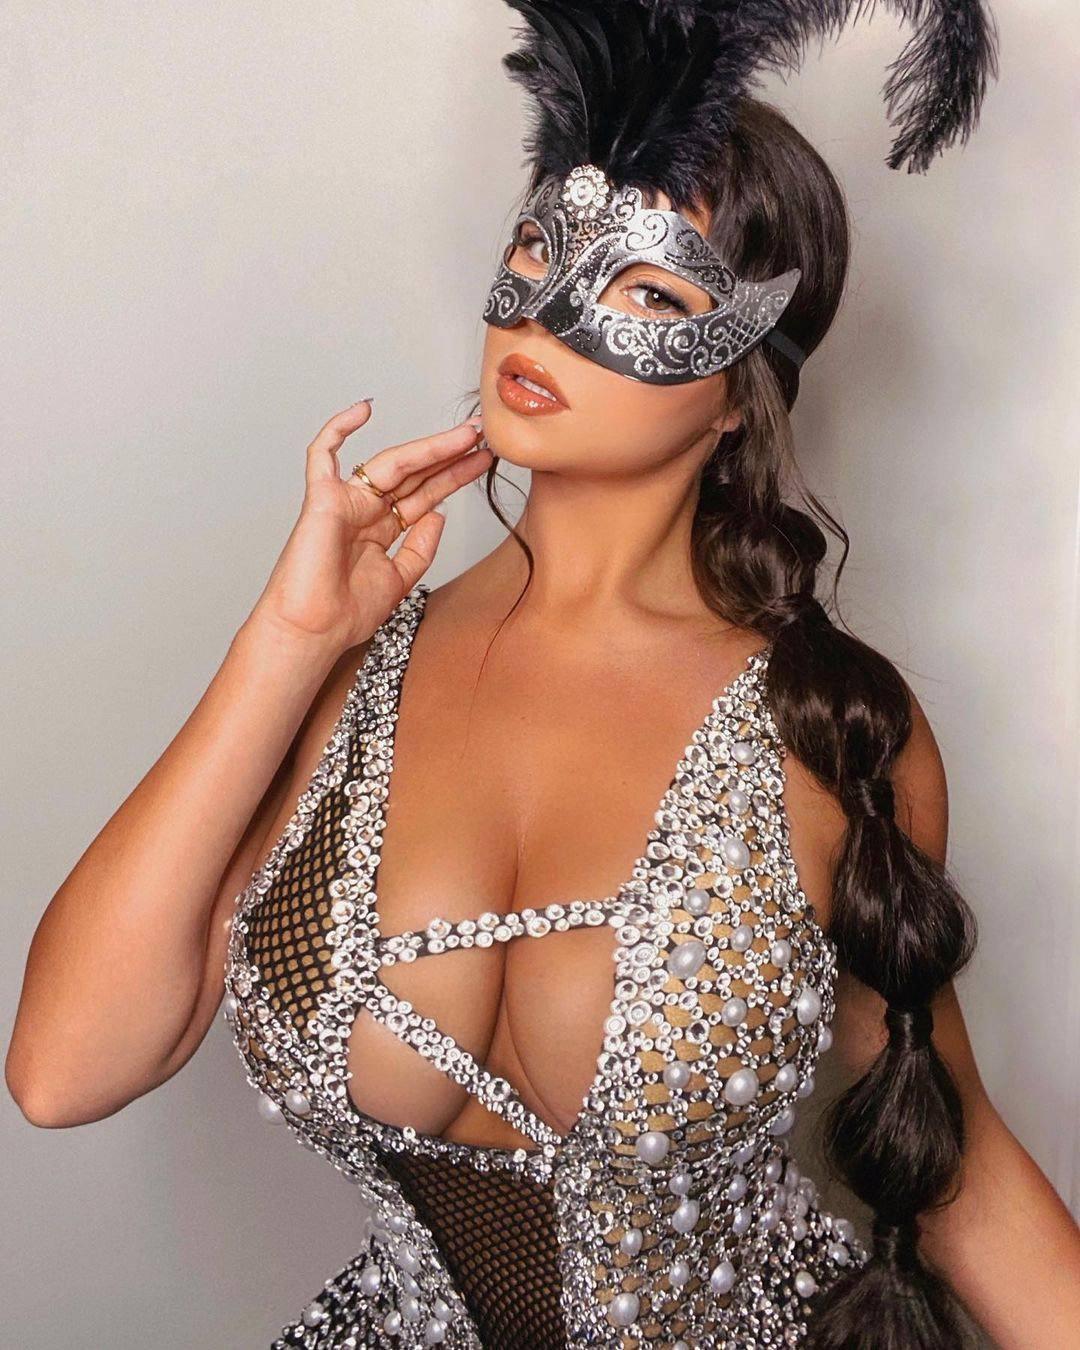 Demi Rose Mawby Huge Sexy Tits